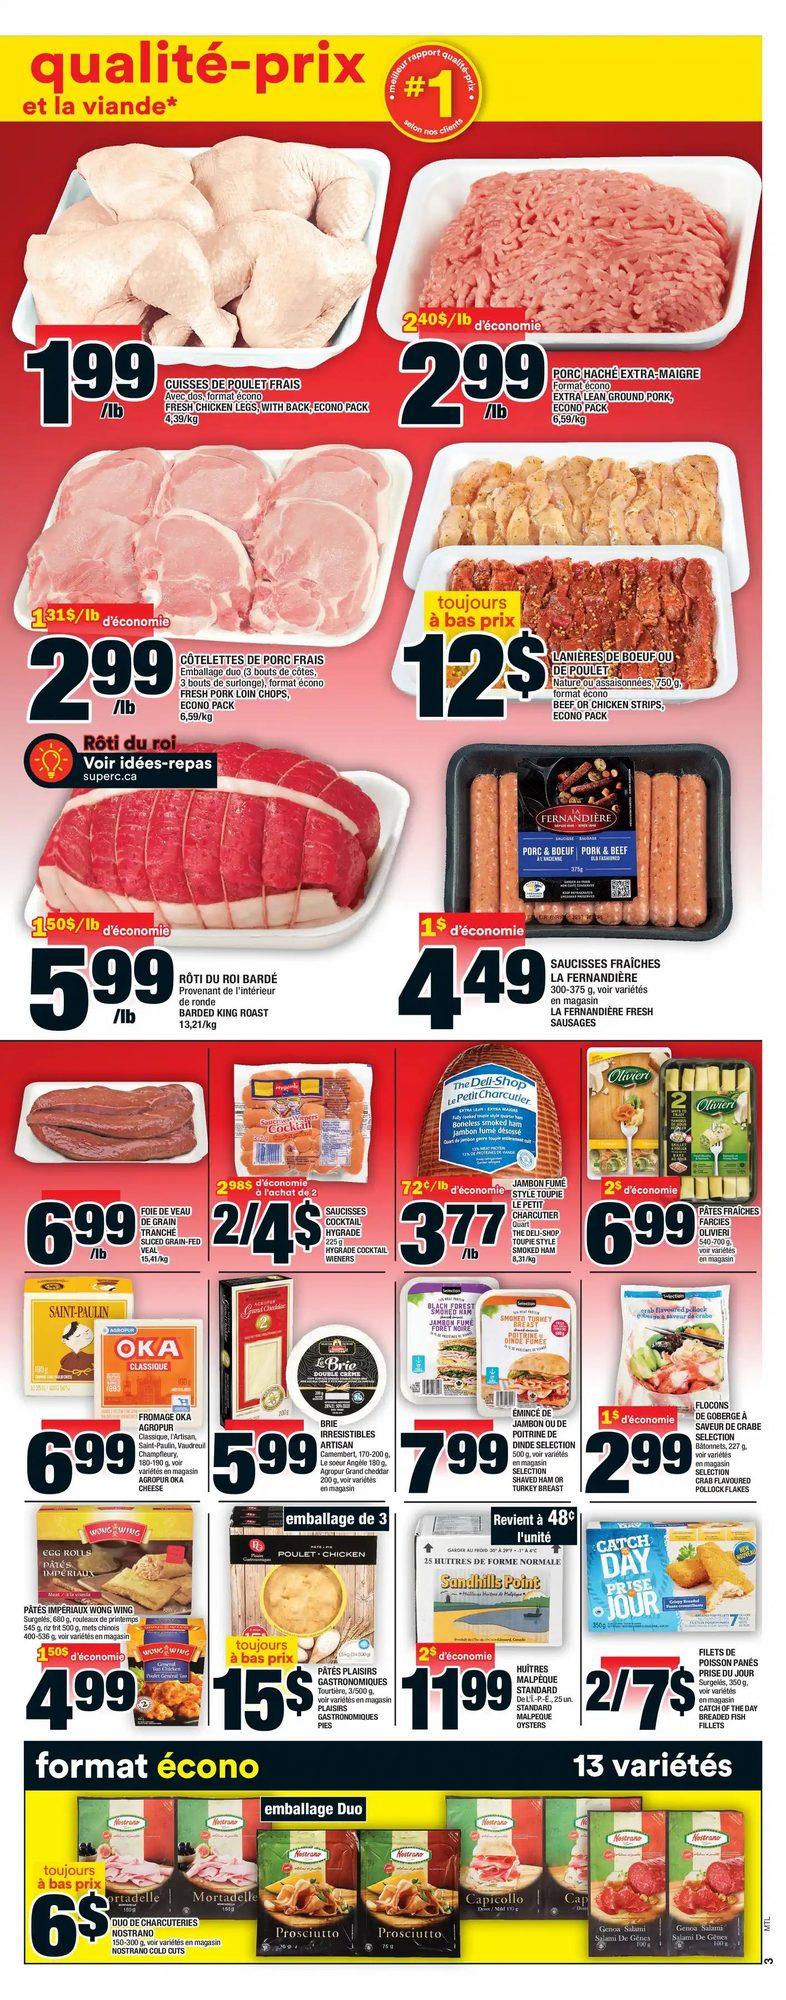 Super C - Weekly Flyer Specials - Page 7